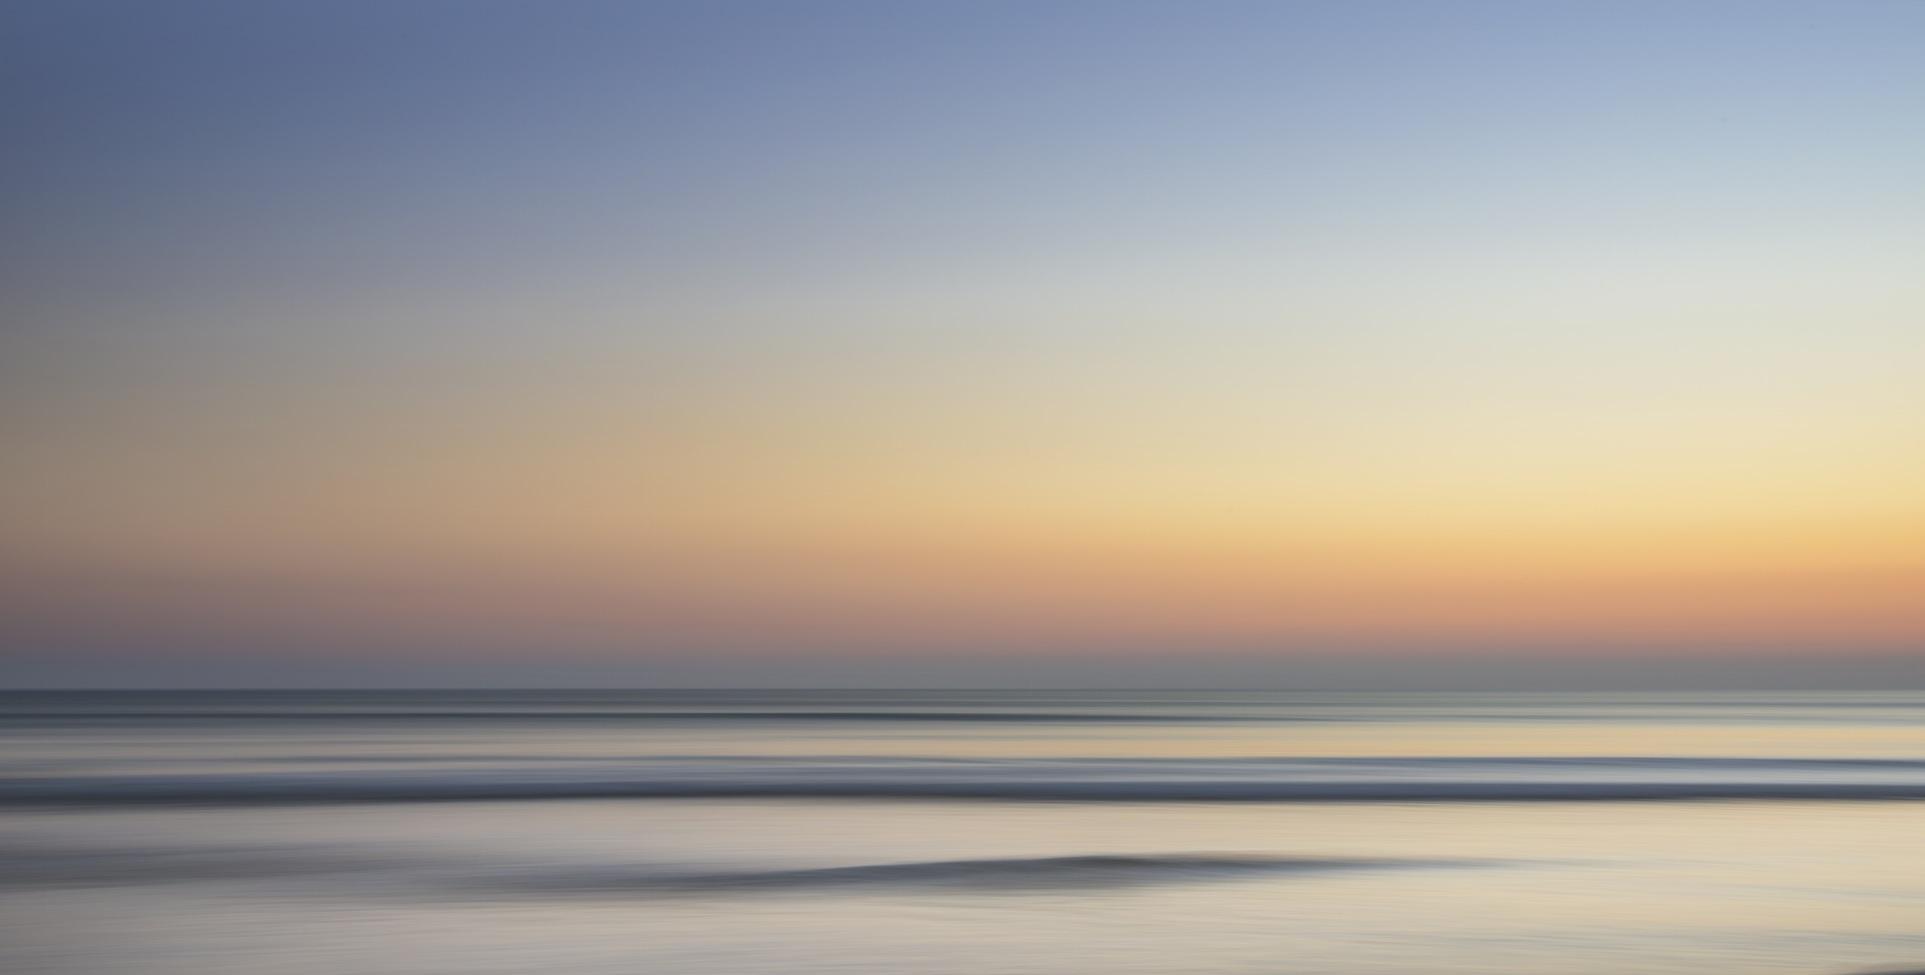 beach-at-dusk.jpeg